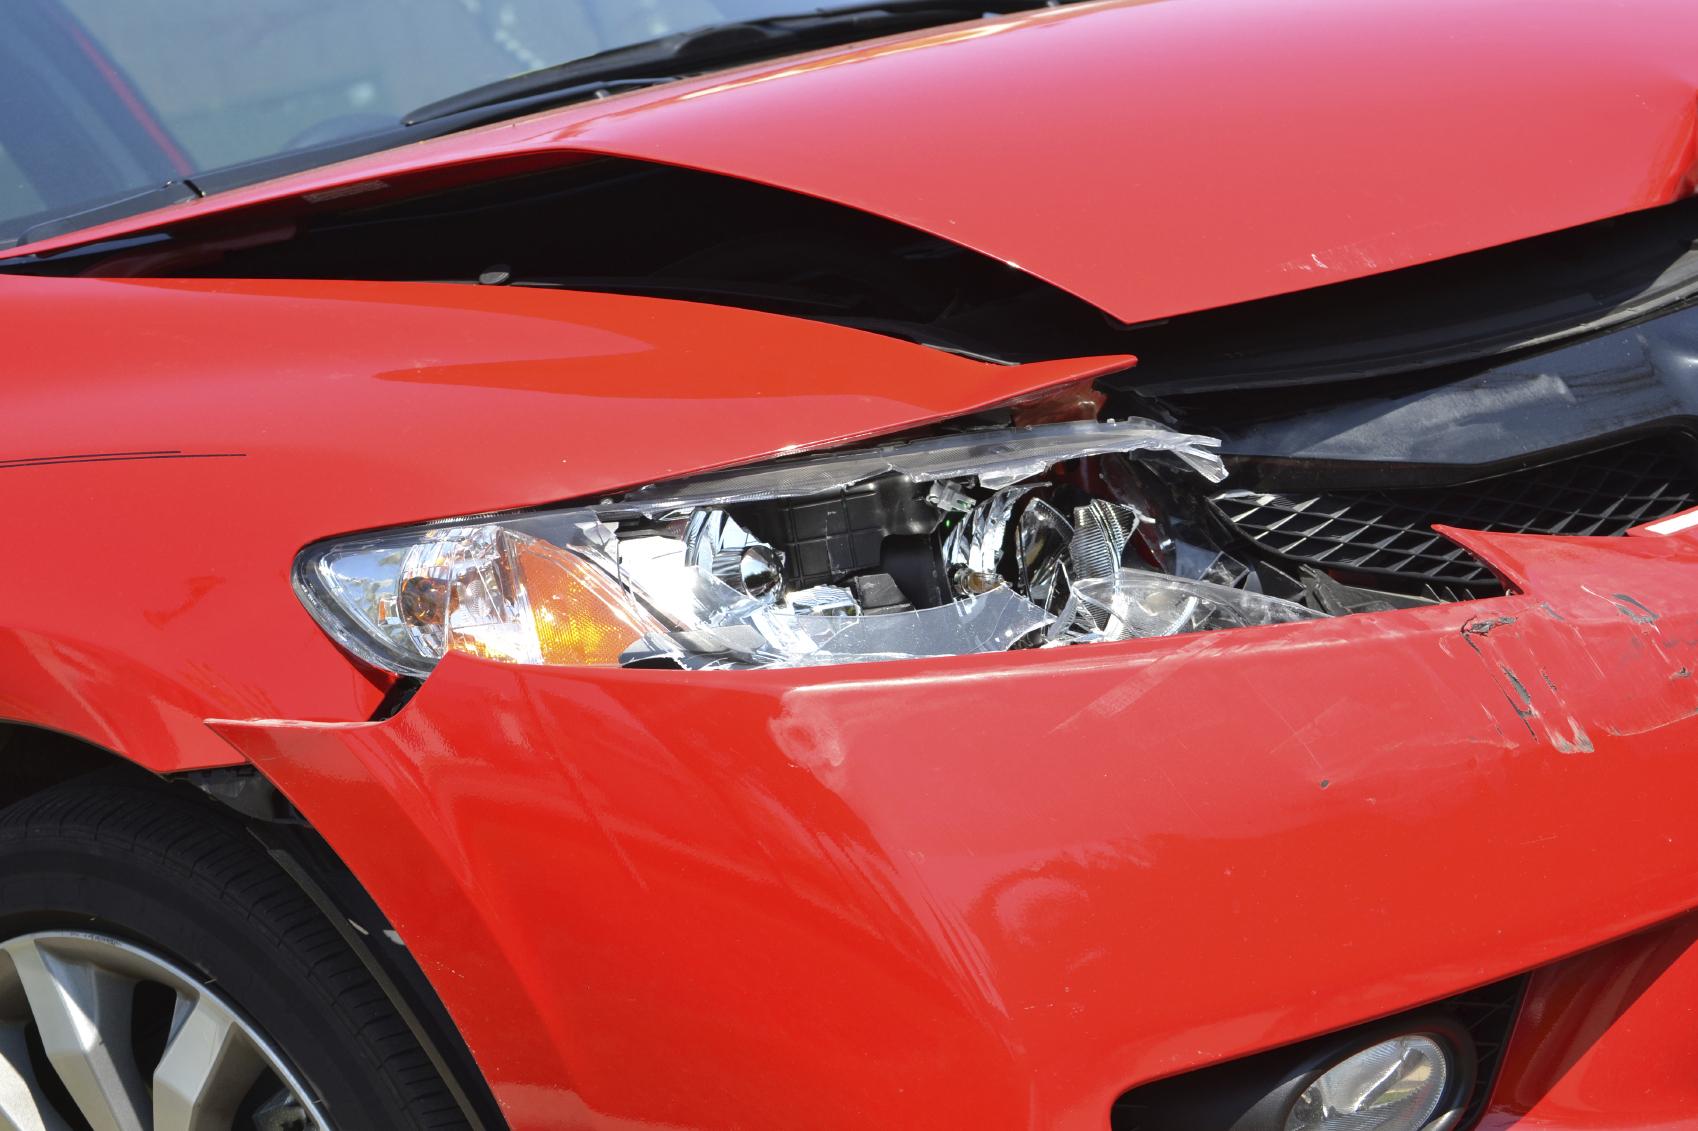 Lease Turn-In Repair in Fort Gratiot, MI